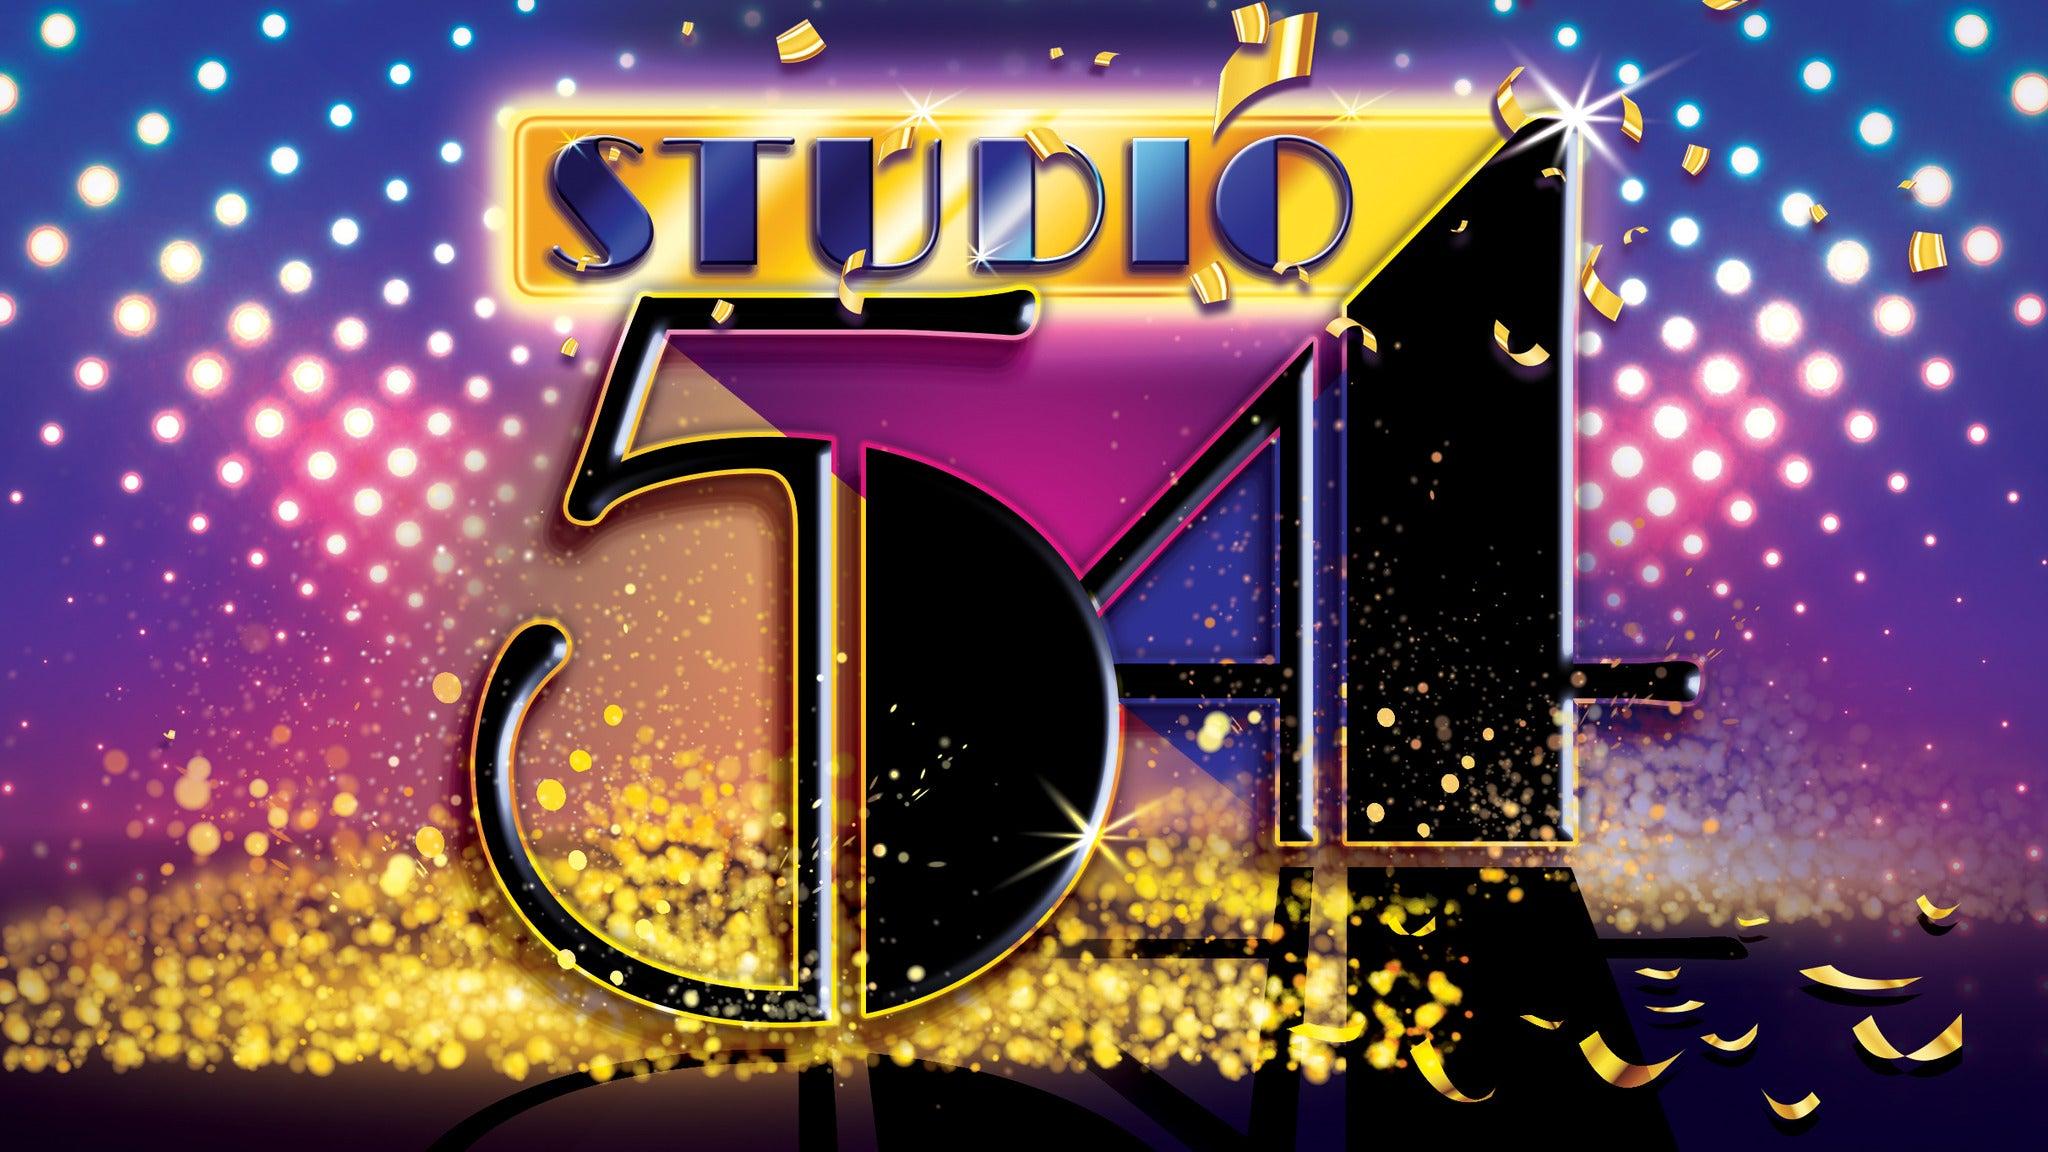 Studio 54 tickets (Copyright © Ticketmaster)